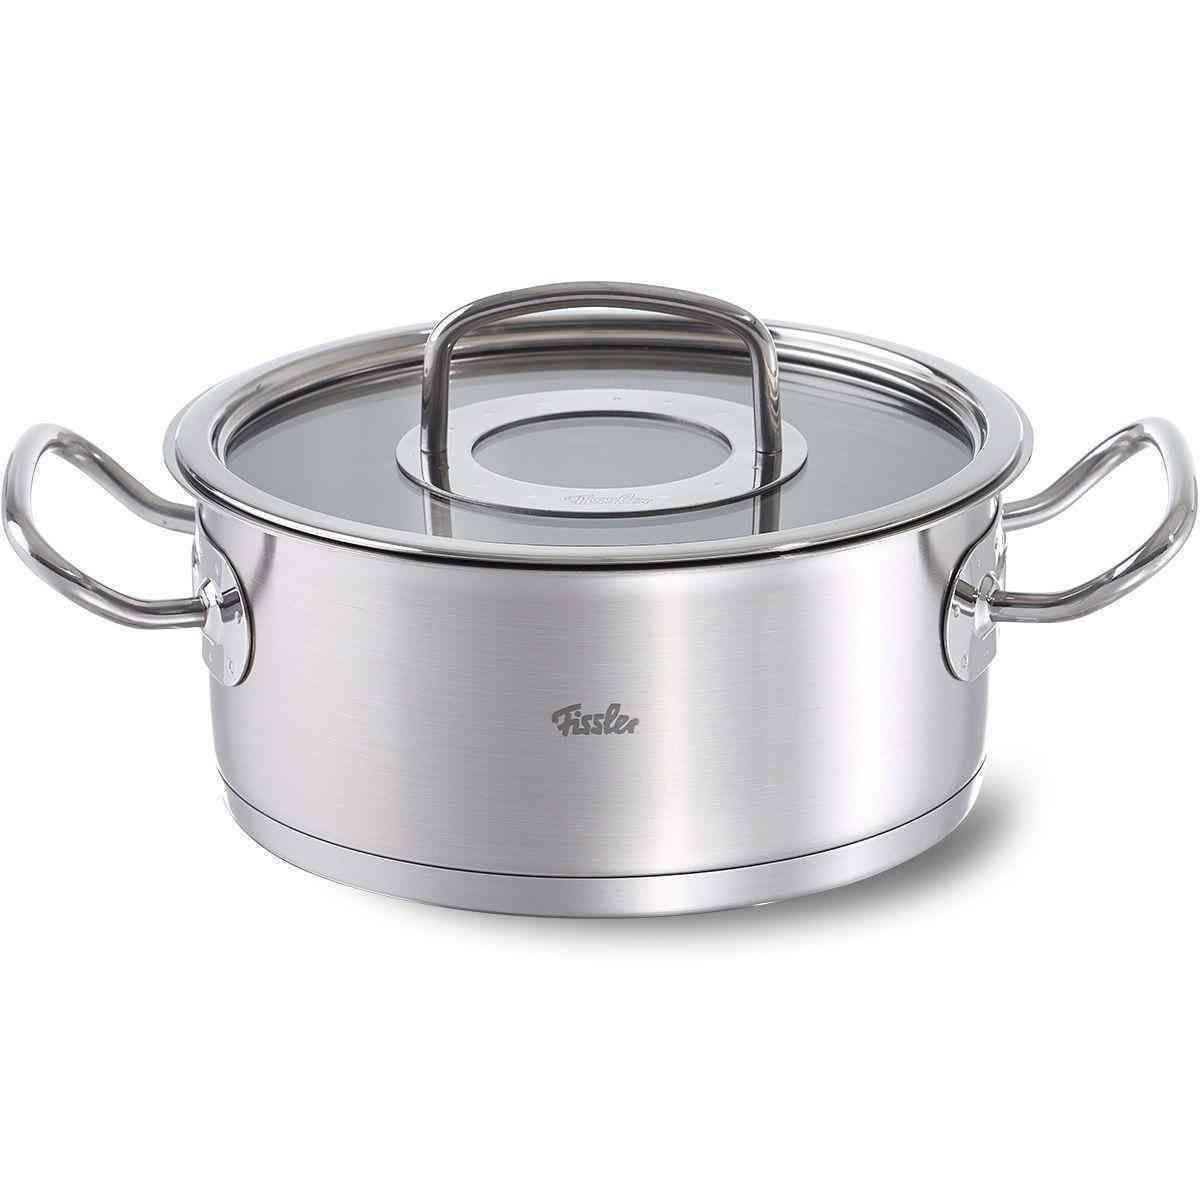 original-profi collection casserole with glass lid 24 cm